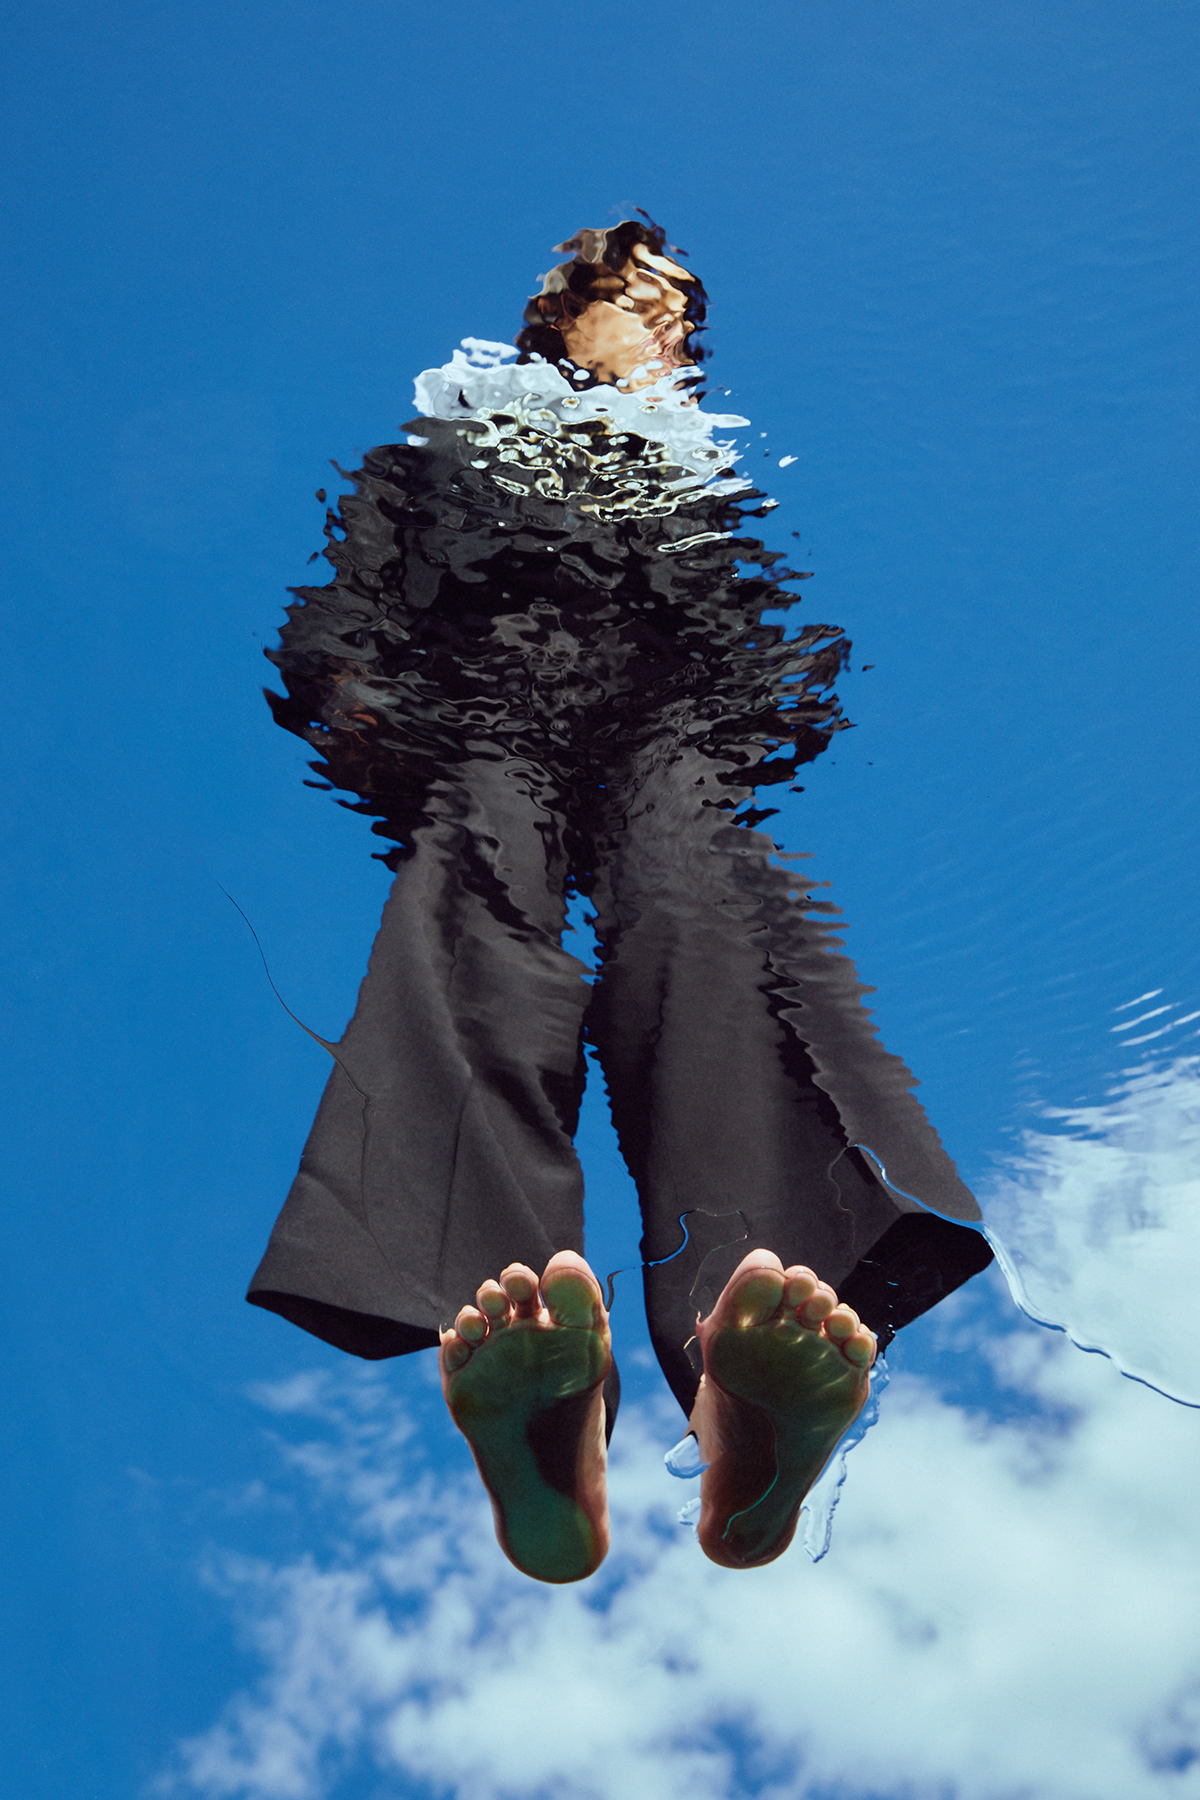 bosco danilgolovkin Fashion  glass golovkin underwater Vesna